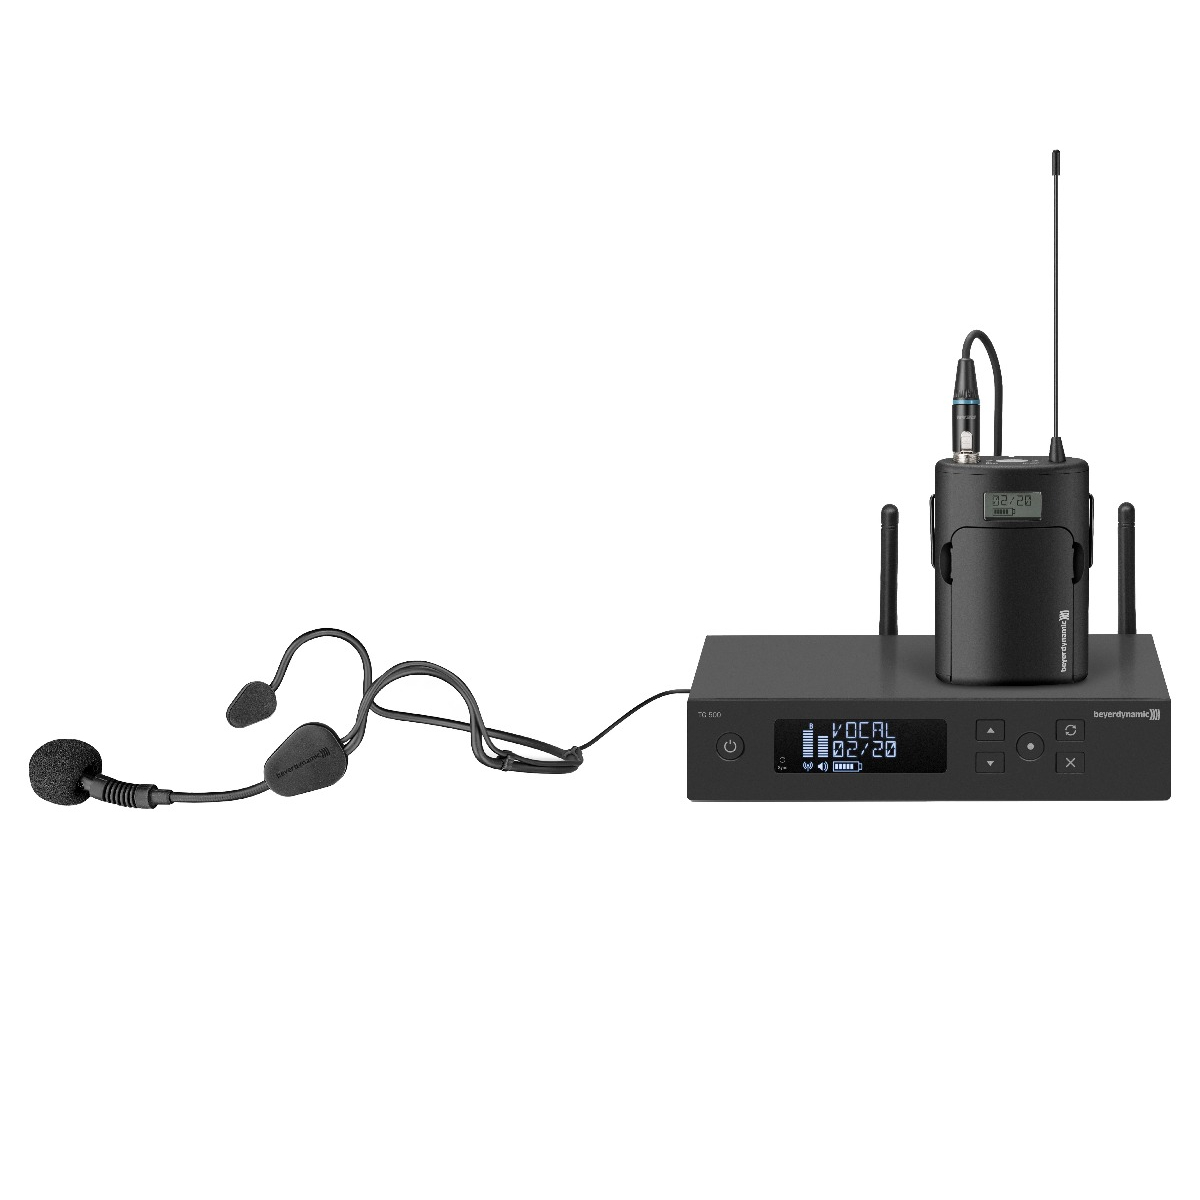 Wireless Headset Microphone Set Beyerdynamic Tg 534